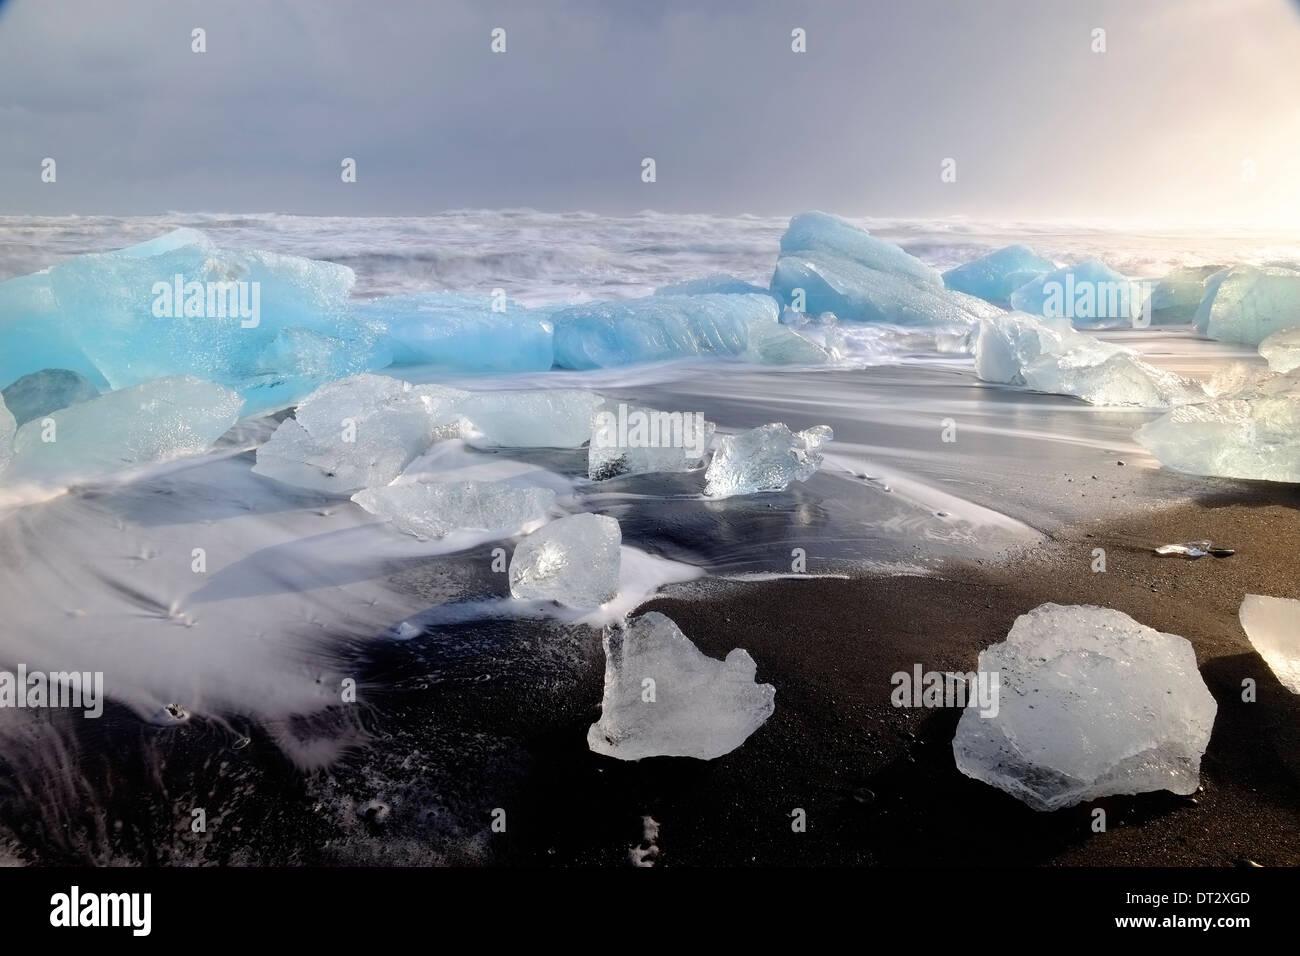 Eisberge und Wellen am Jökulsárlón Strand, Polarregion, Südisland Stockbild